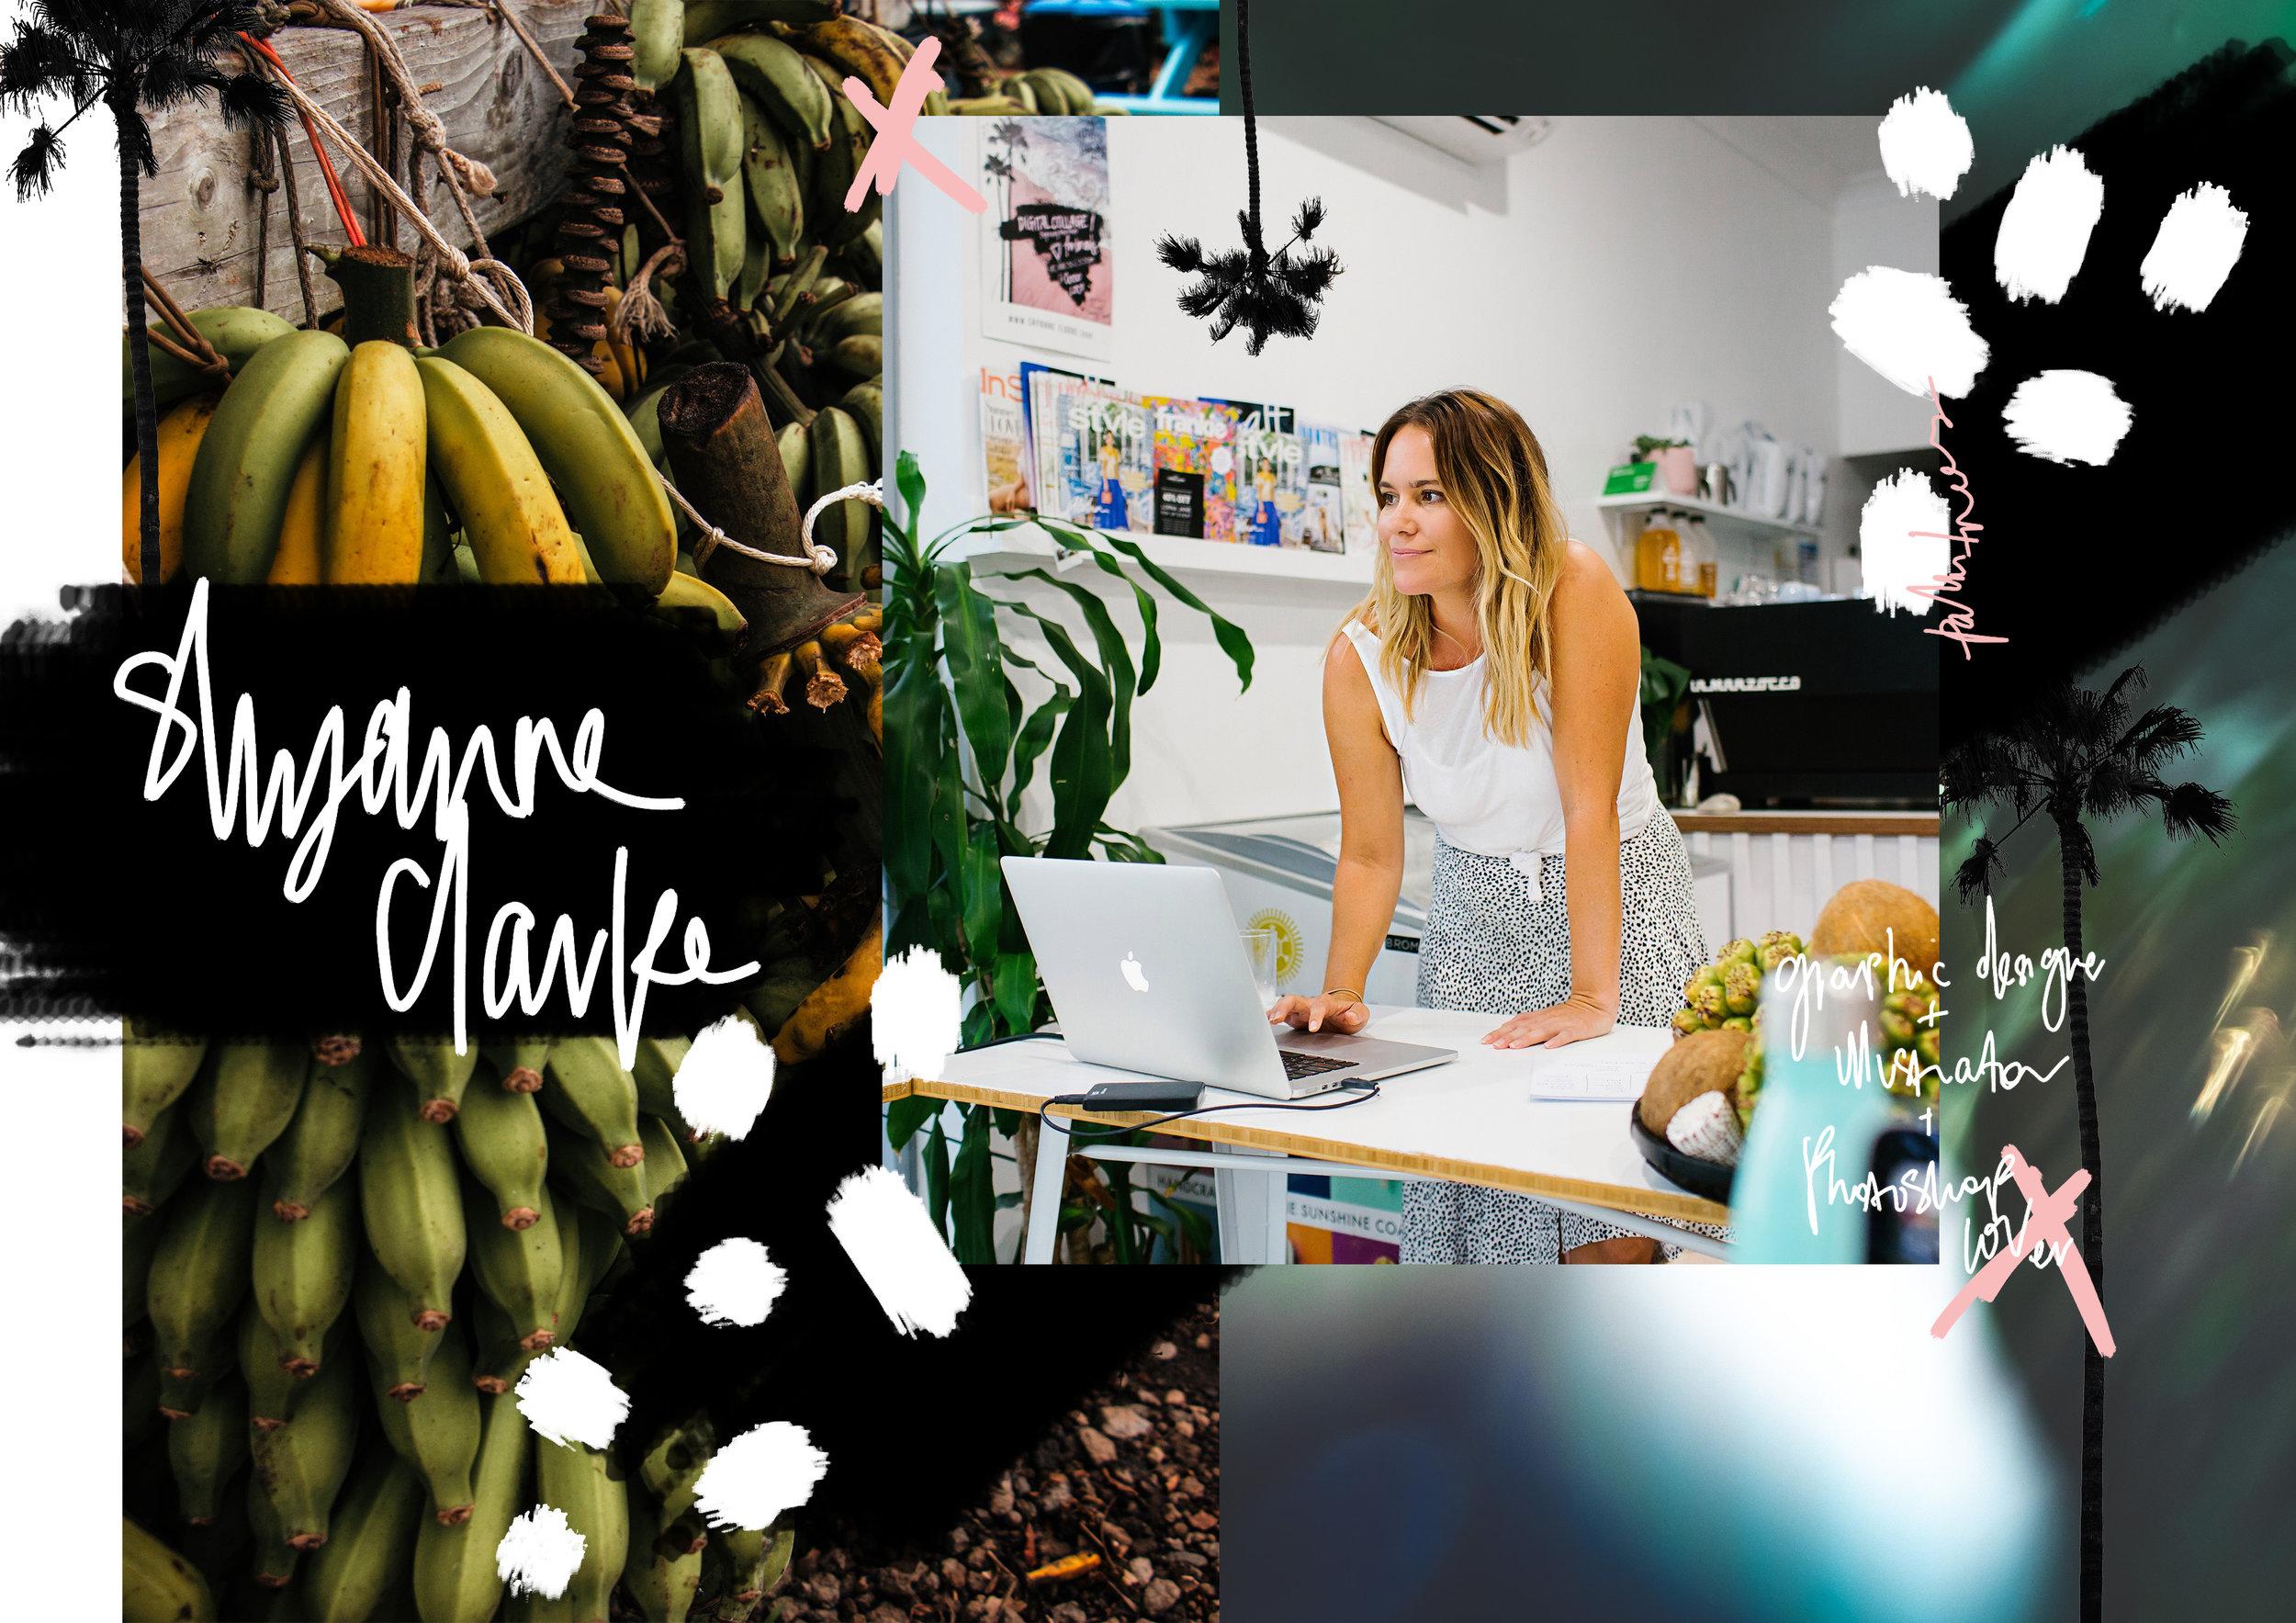 Shyanne Clarke Graphic Design_ Illustrator_ Photoshop Teacher_ Digital Collage.jpg